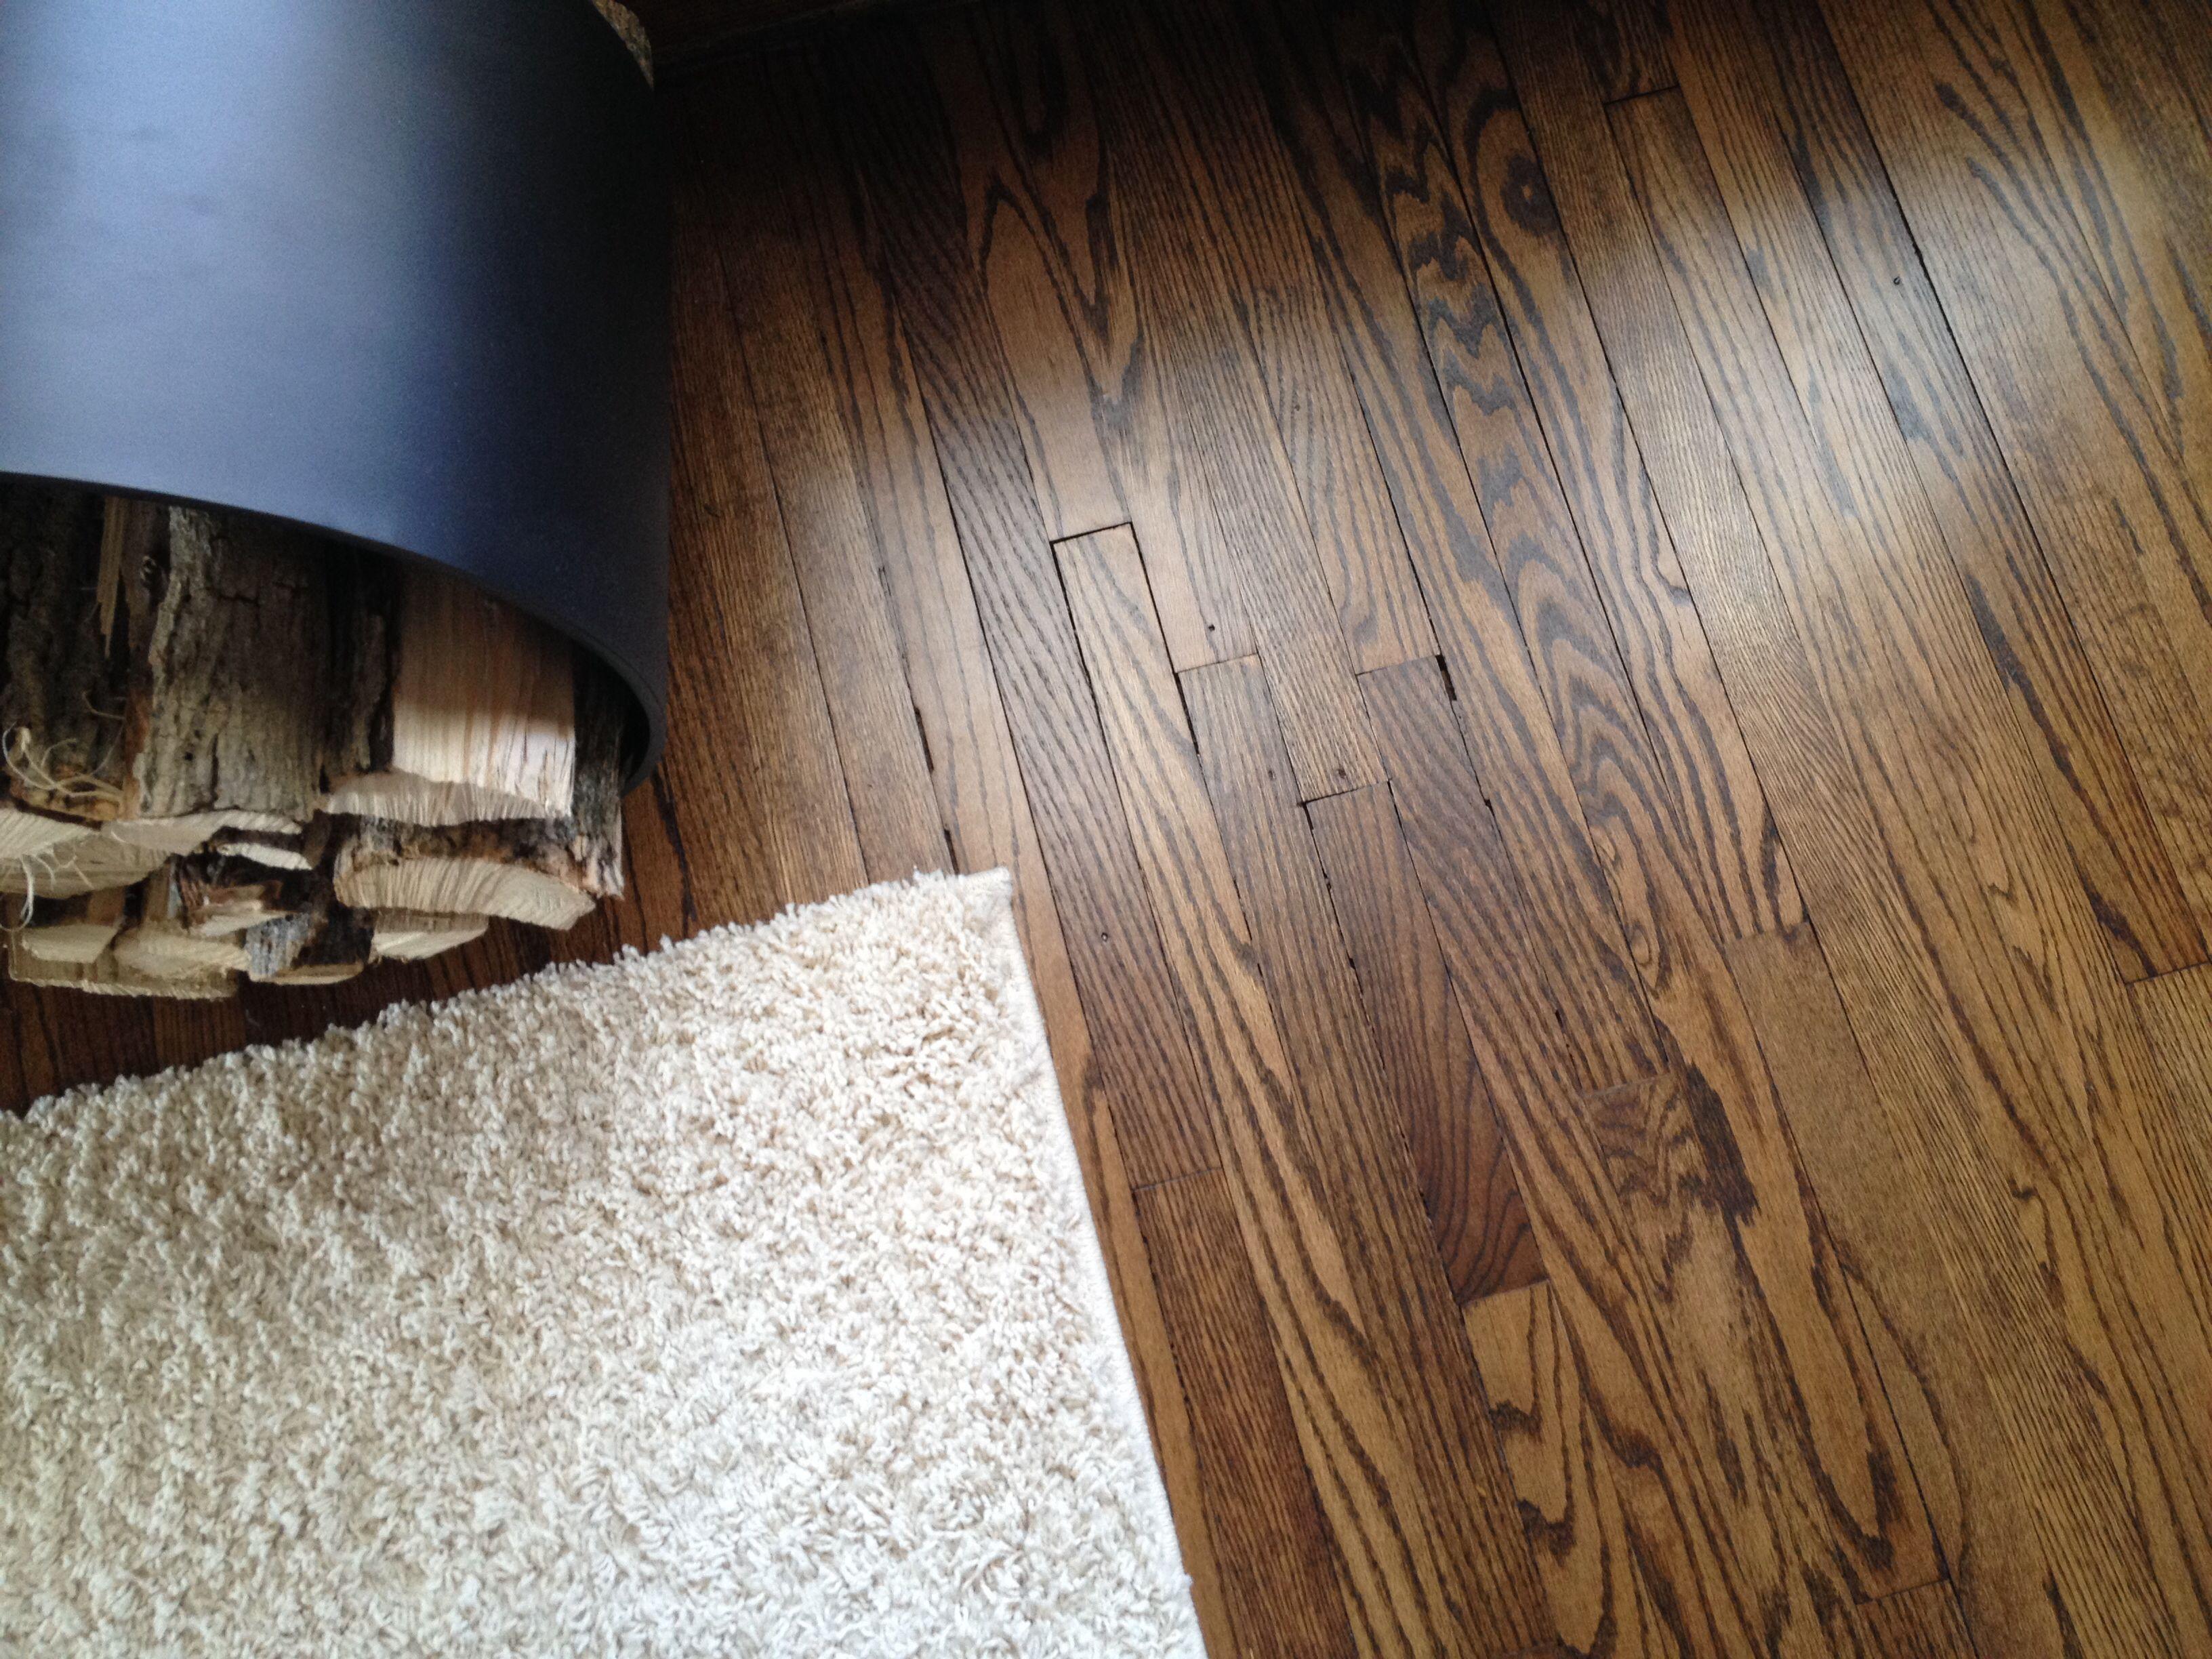 hardwood floor stain colors oak of 113 year old original oak floors refinished in espresso stain with regard to 113 year old original oak floors refinished in espresso stain